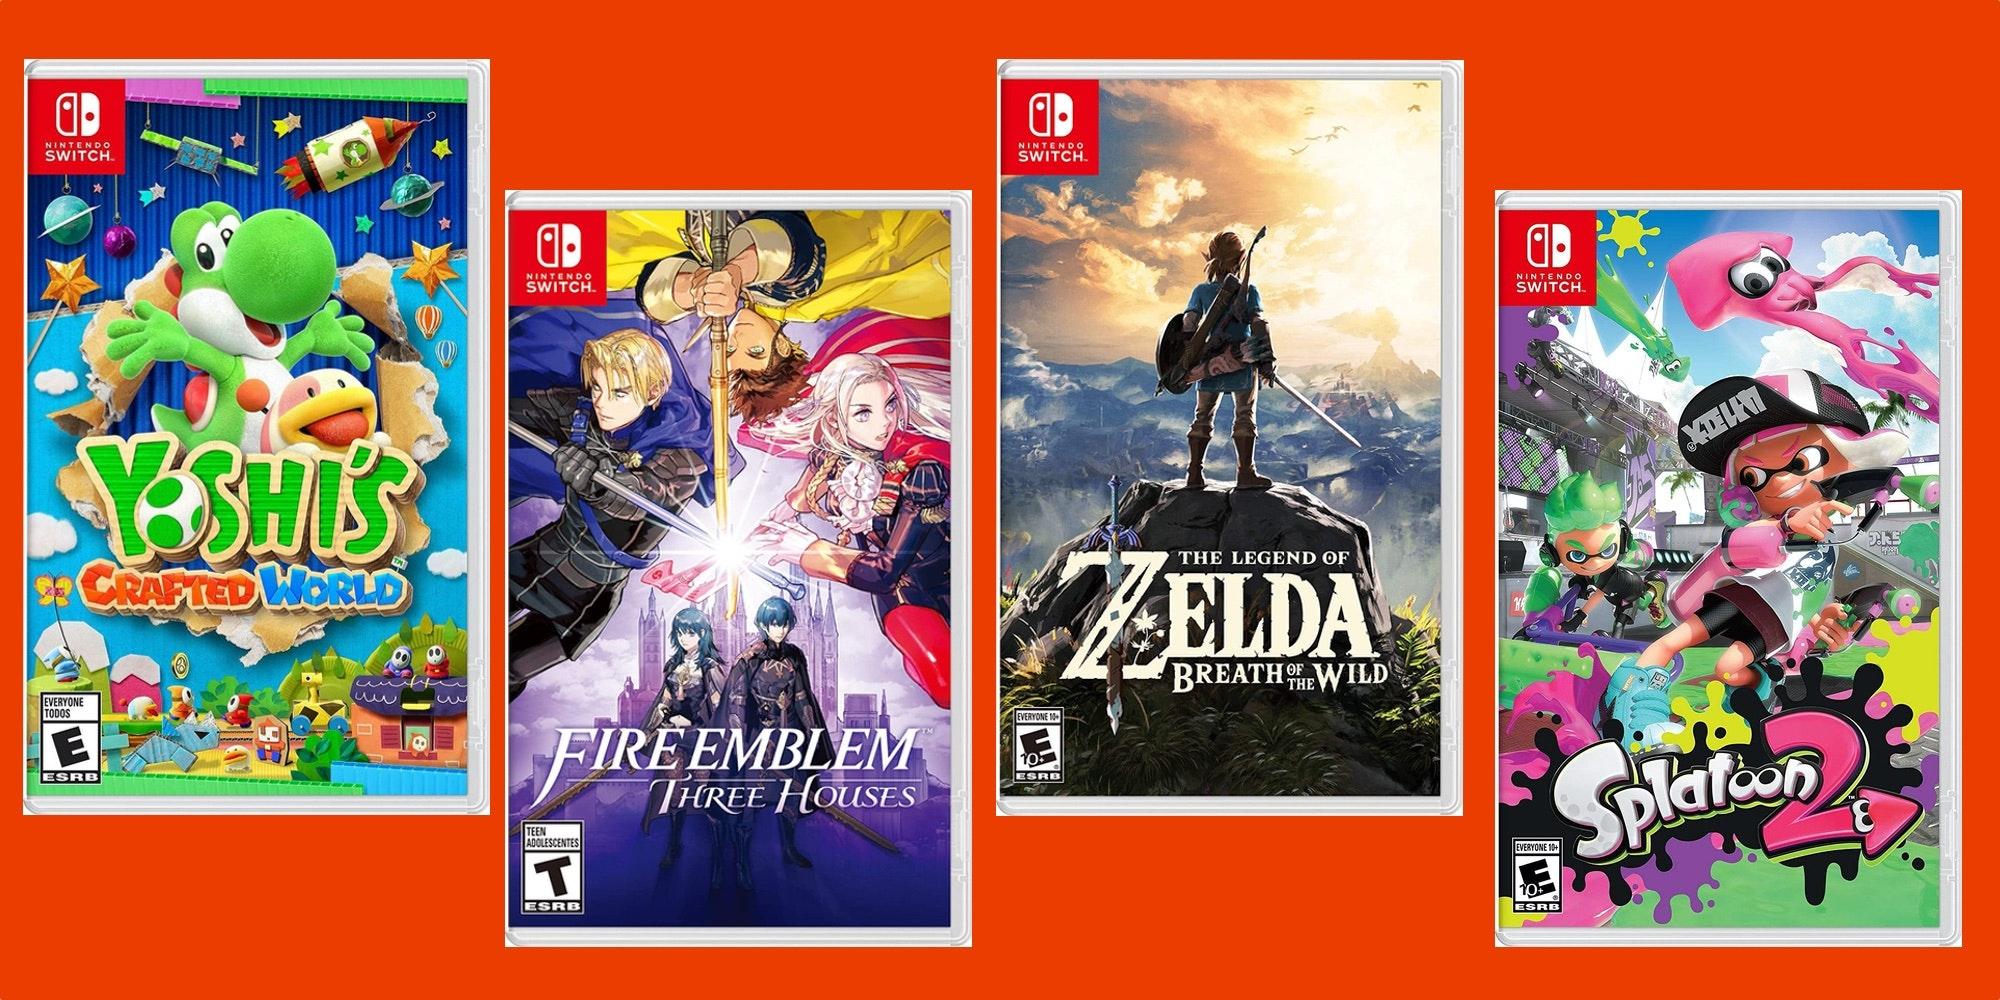 Nintendo Prime Day deals